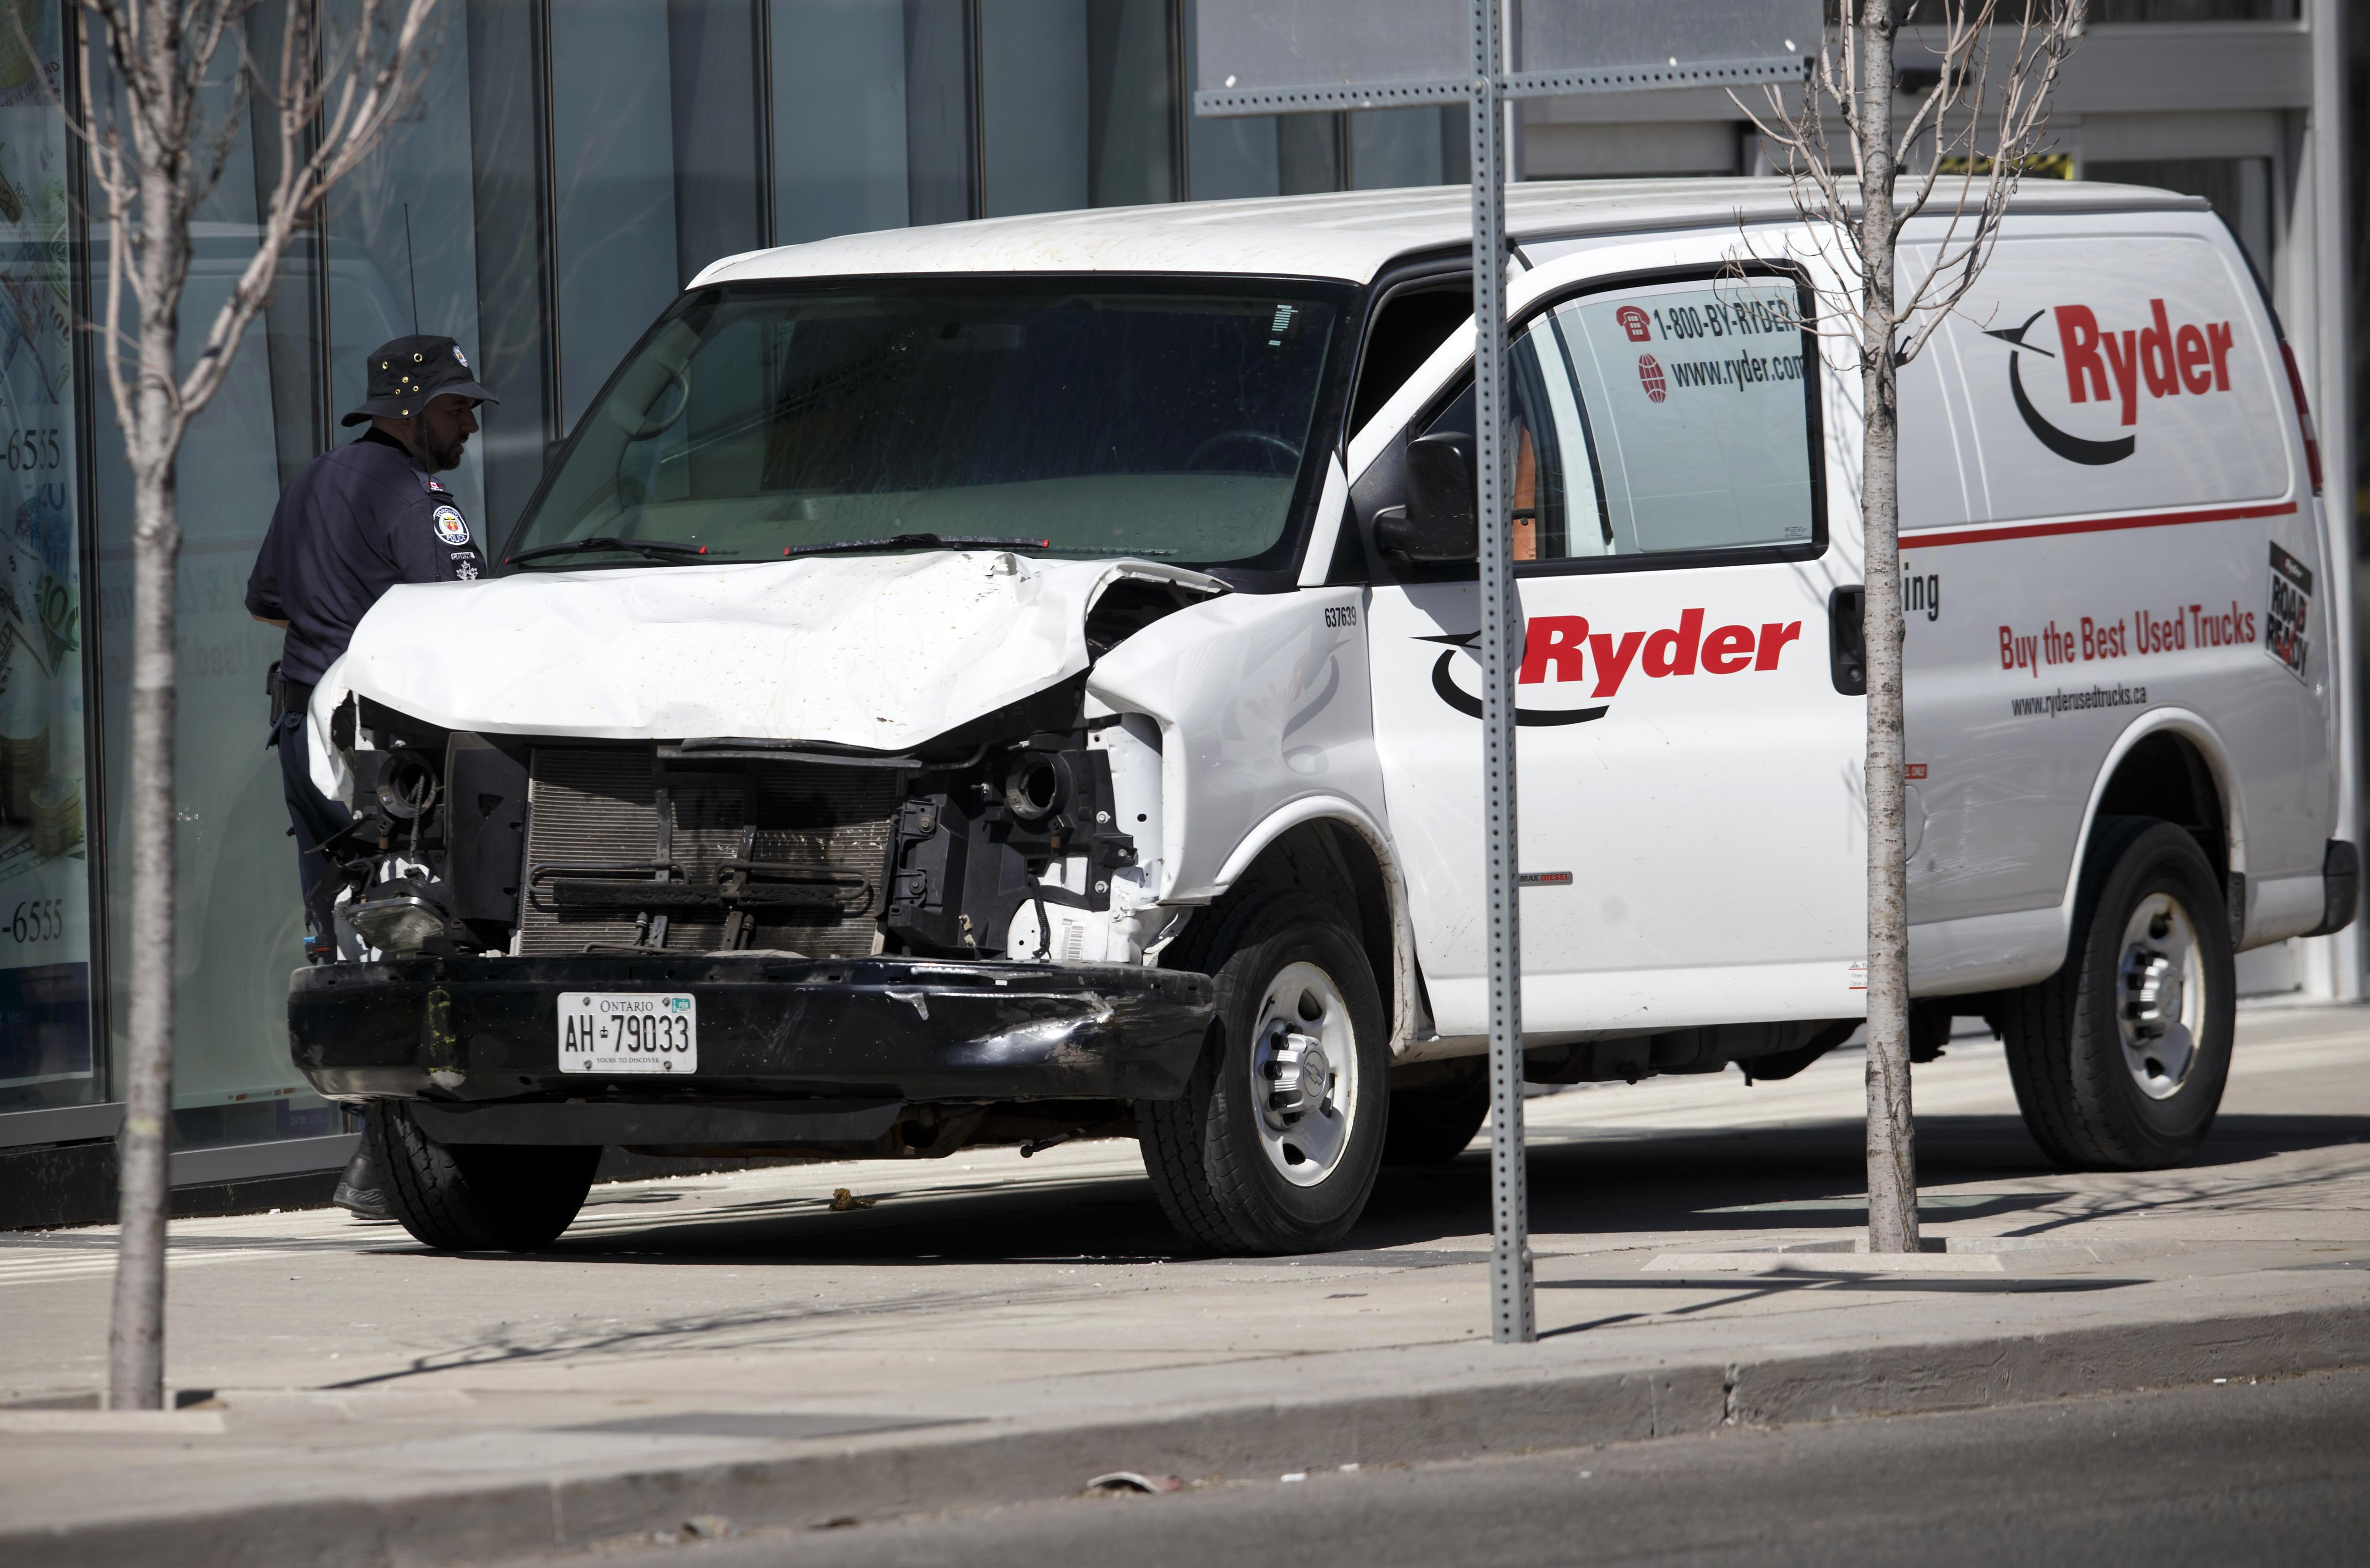 toronto: van hits pedestrians today, killing 10, injuring 15